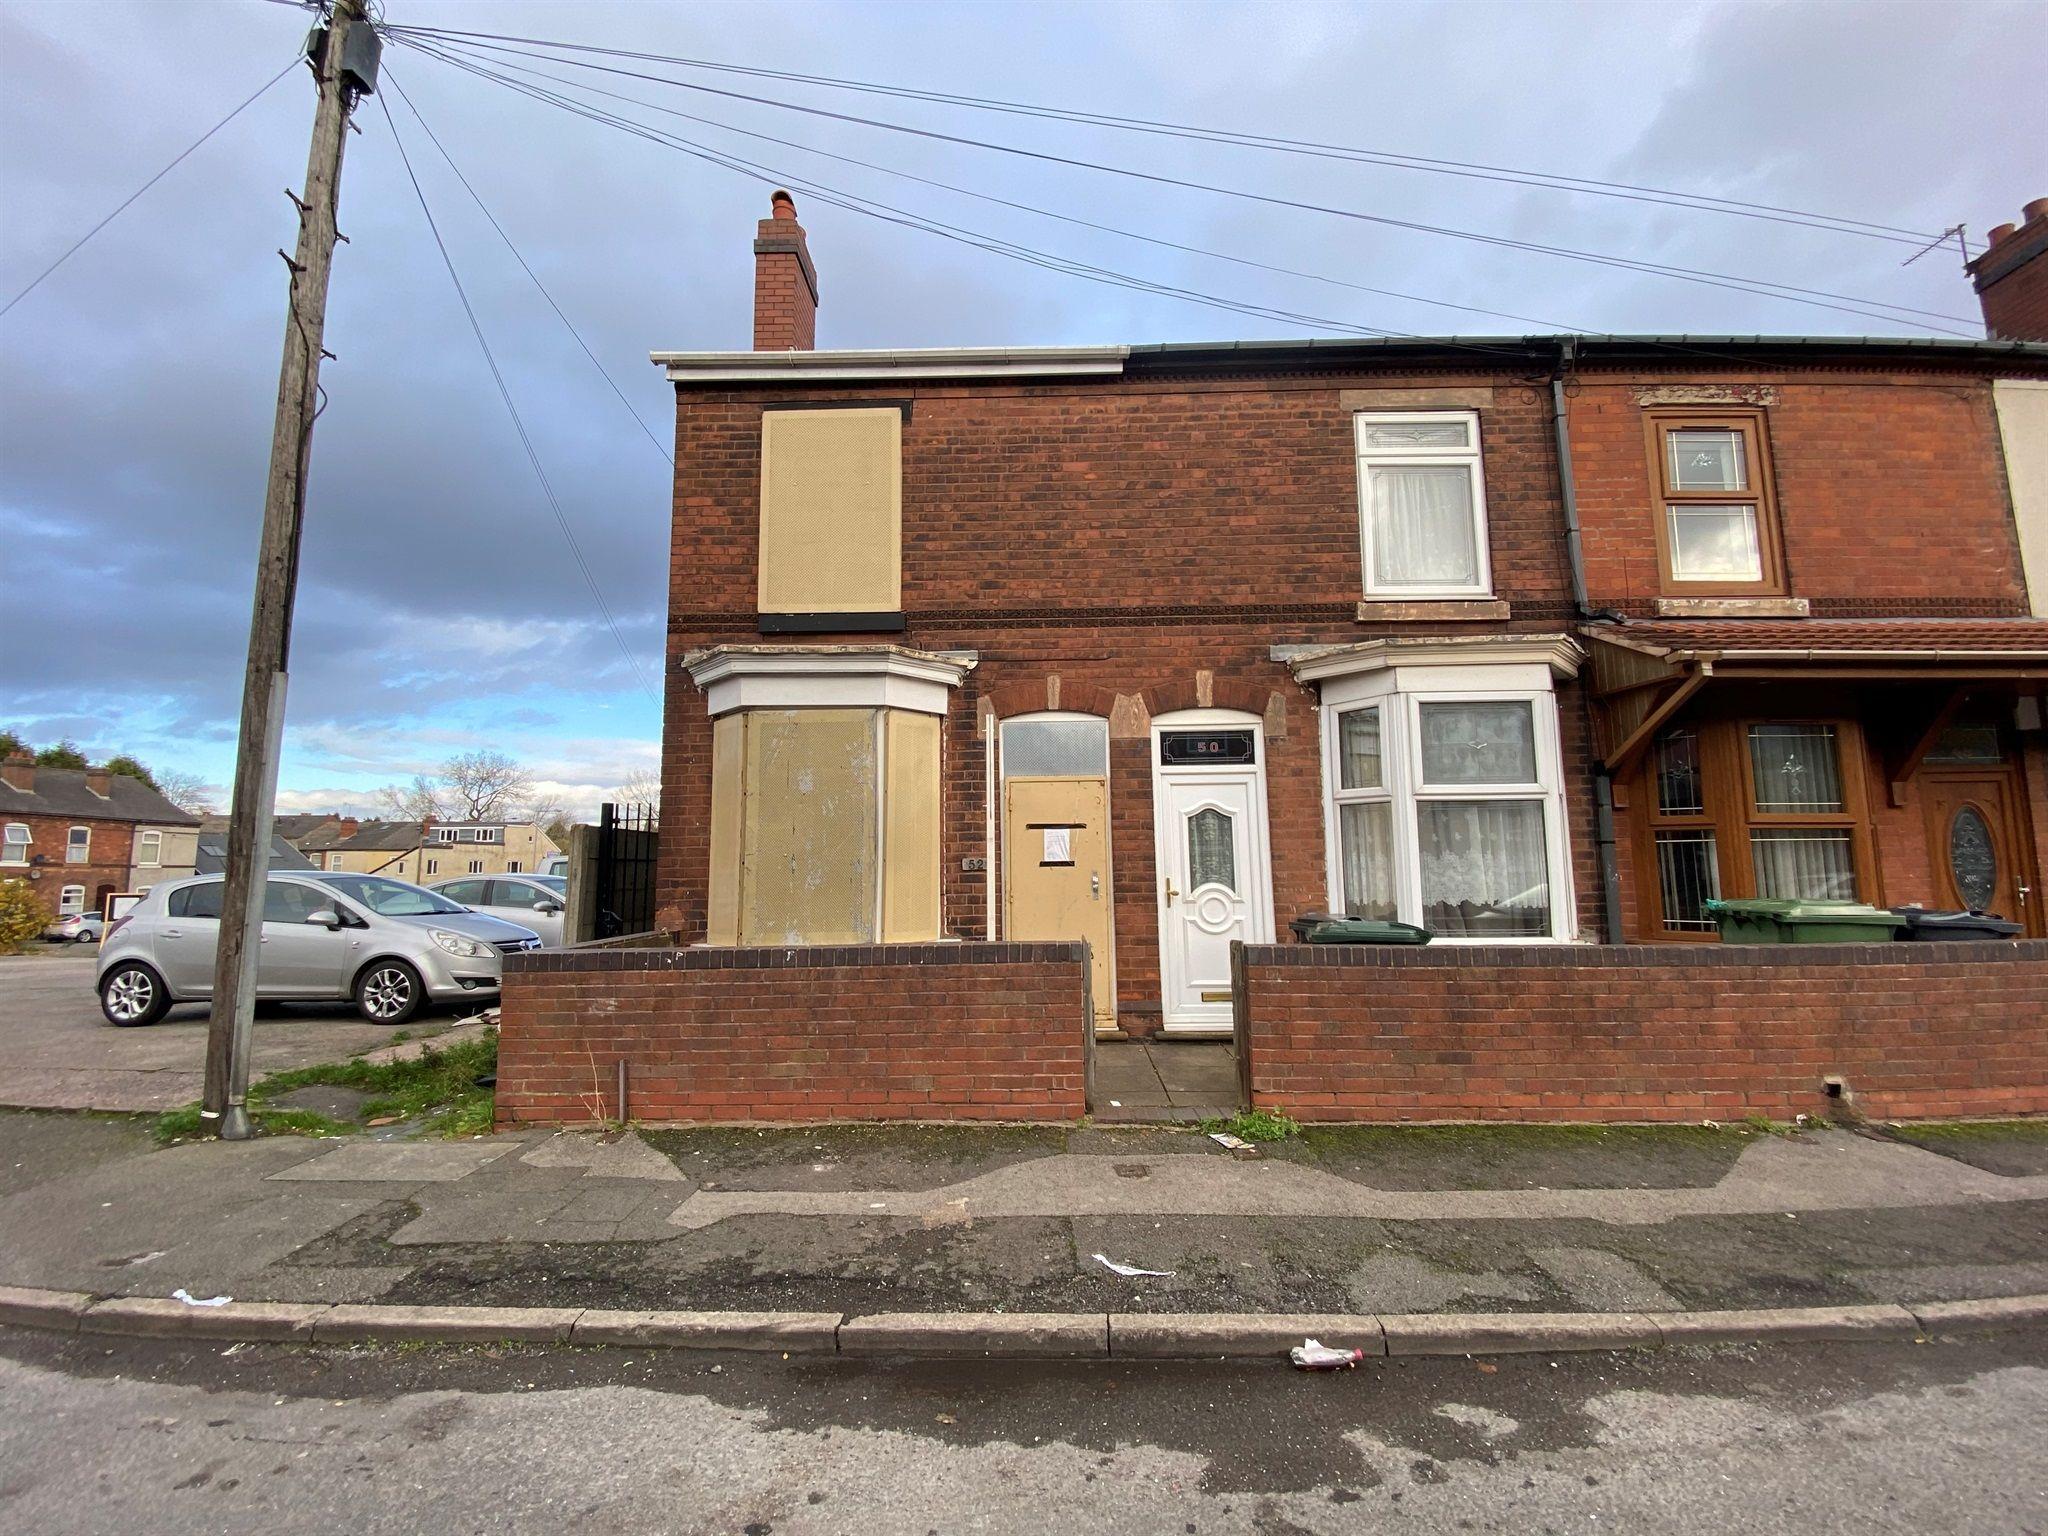 Property photo 1 of 5.